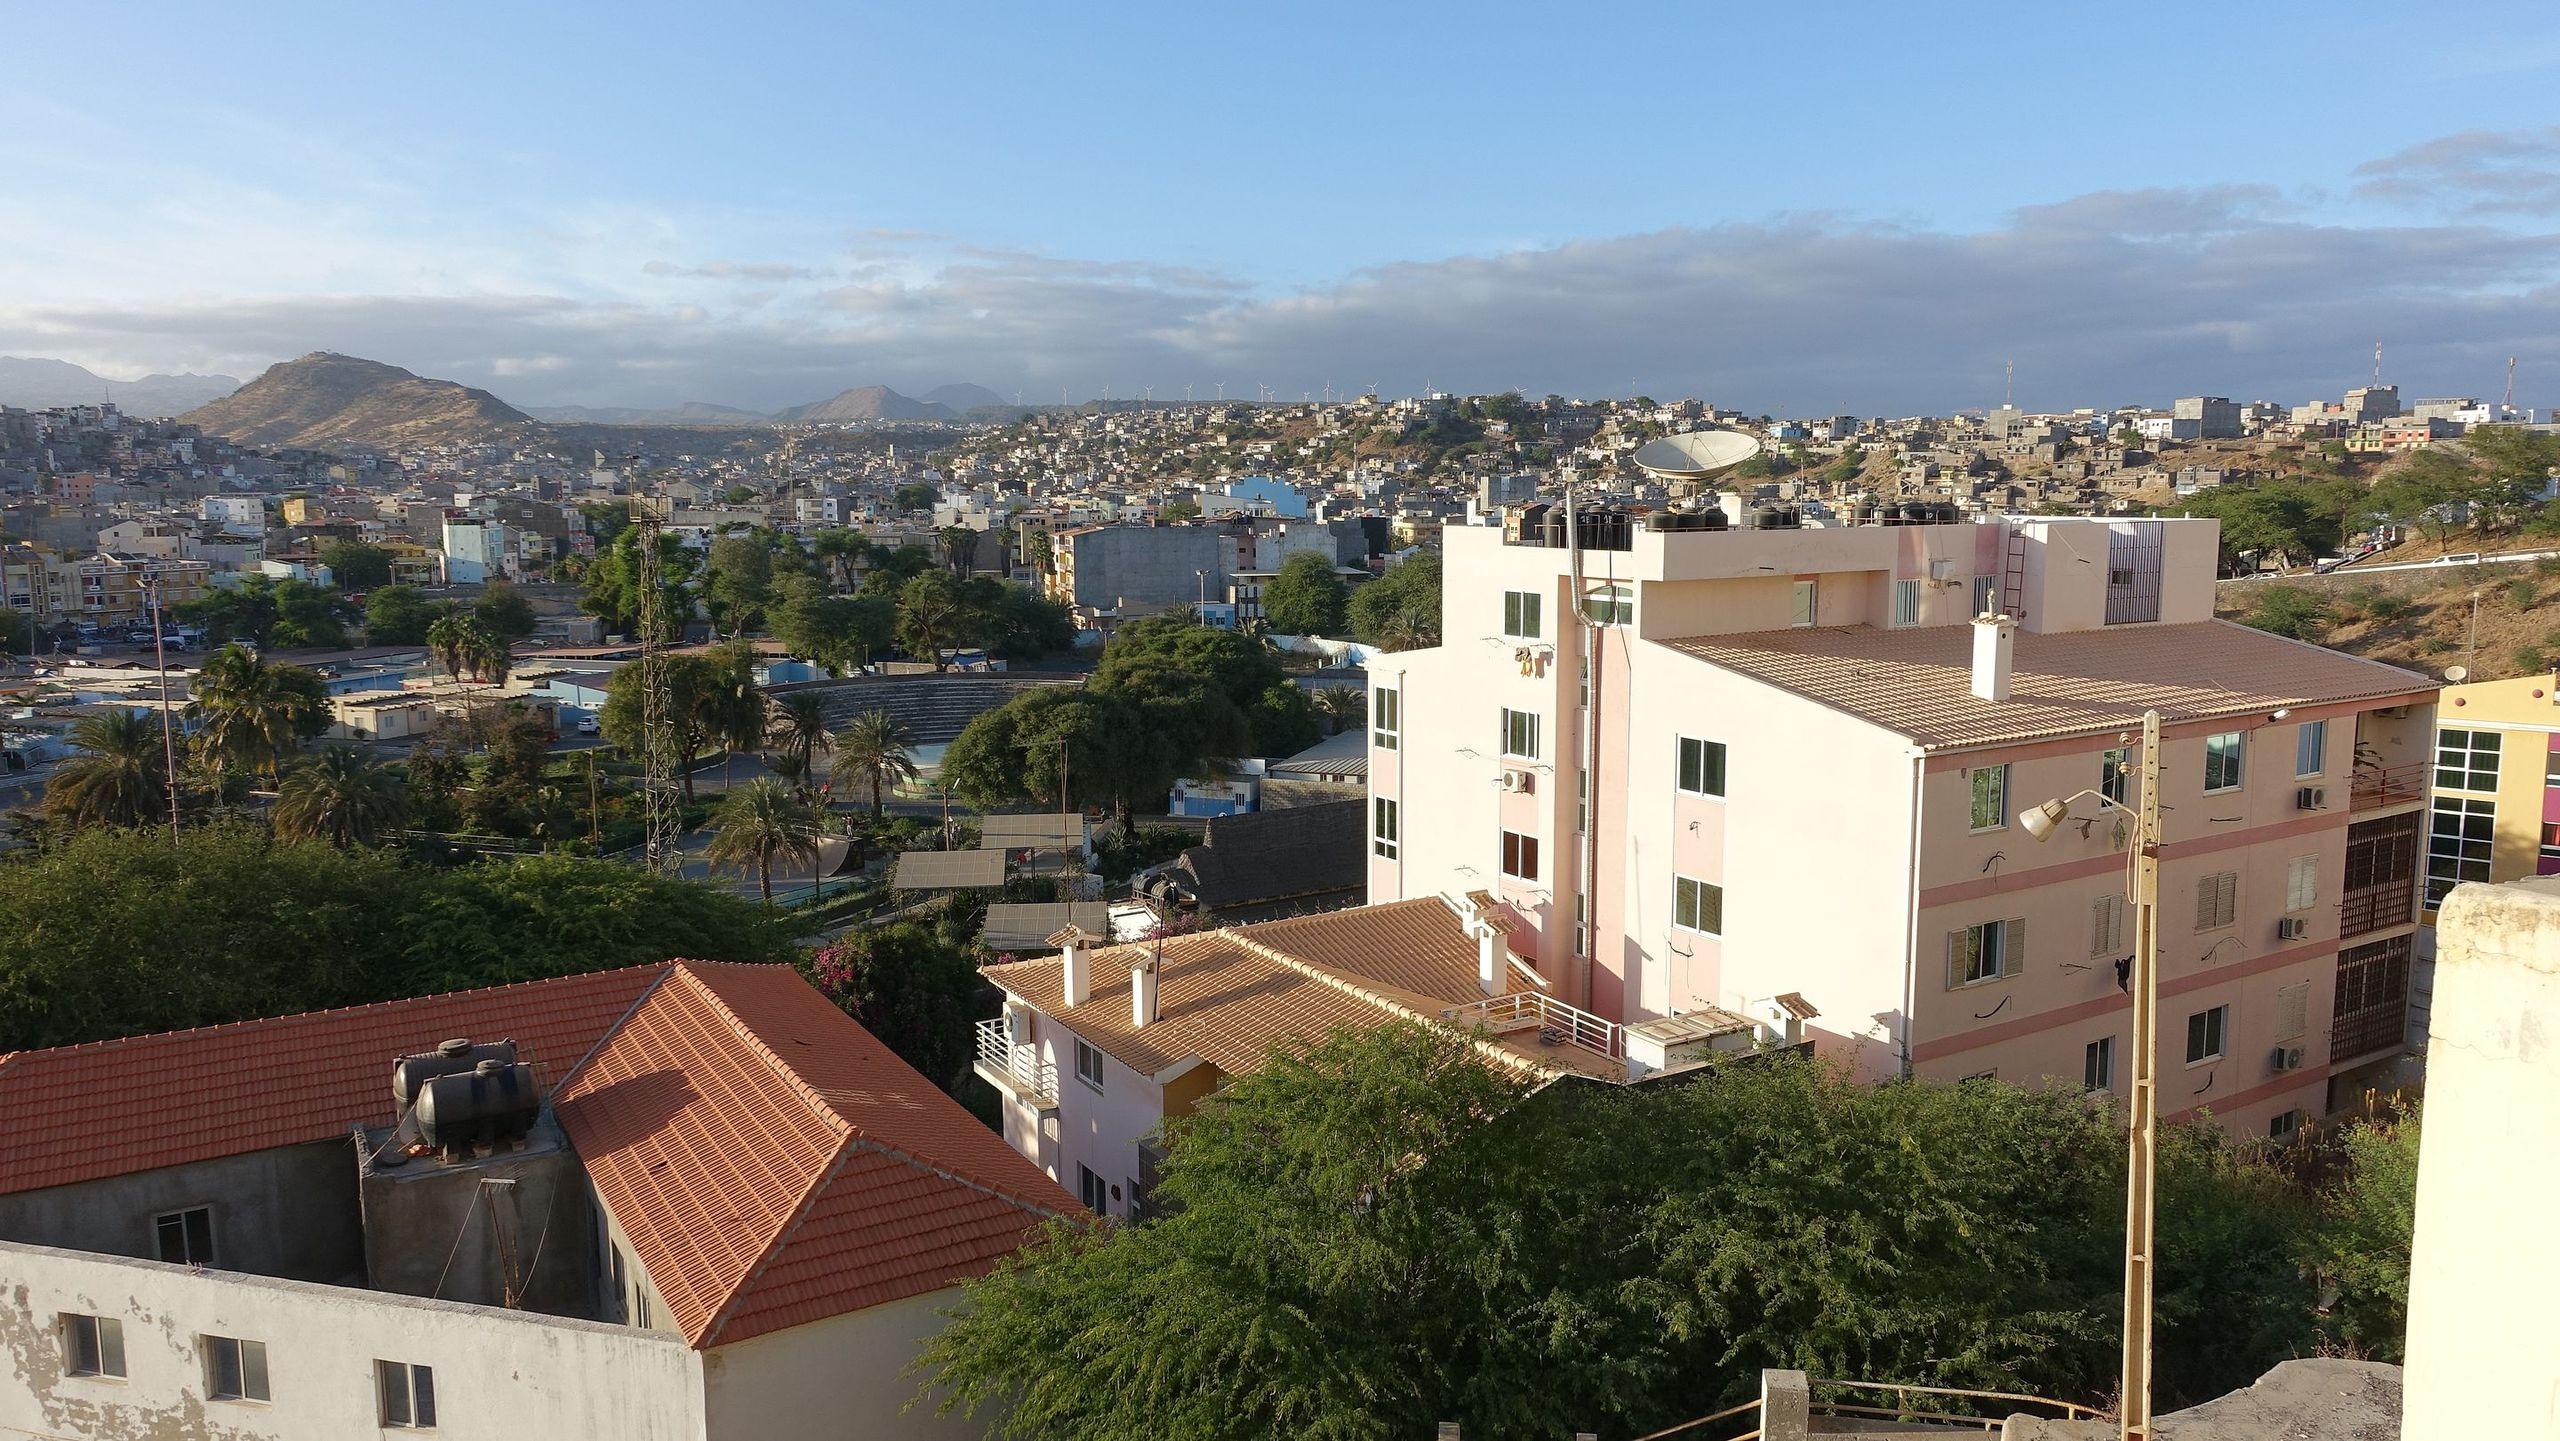 Praia_-_Stadt_vom_Plateau